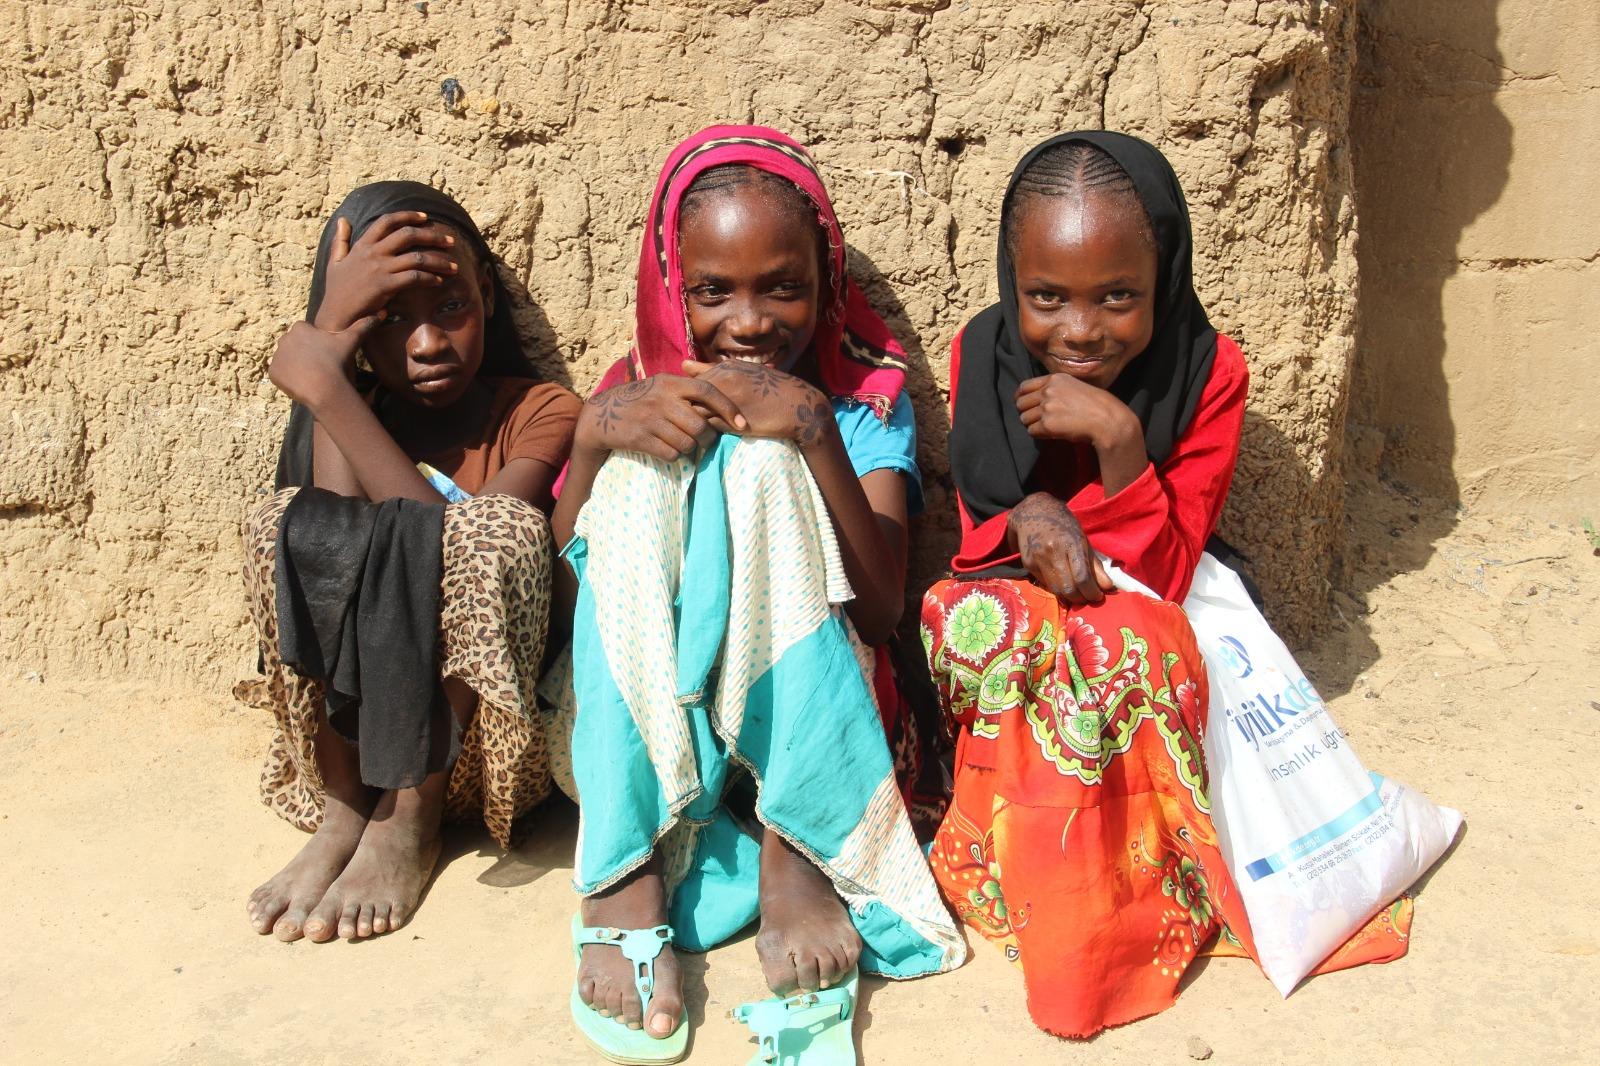 İyilik der kurban afrika.jpg